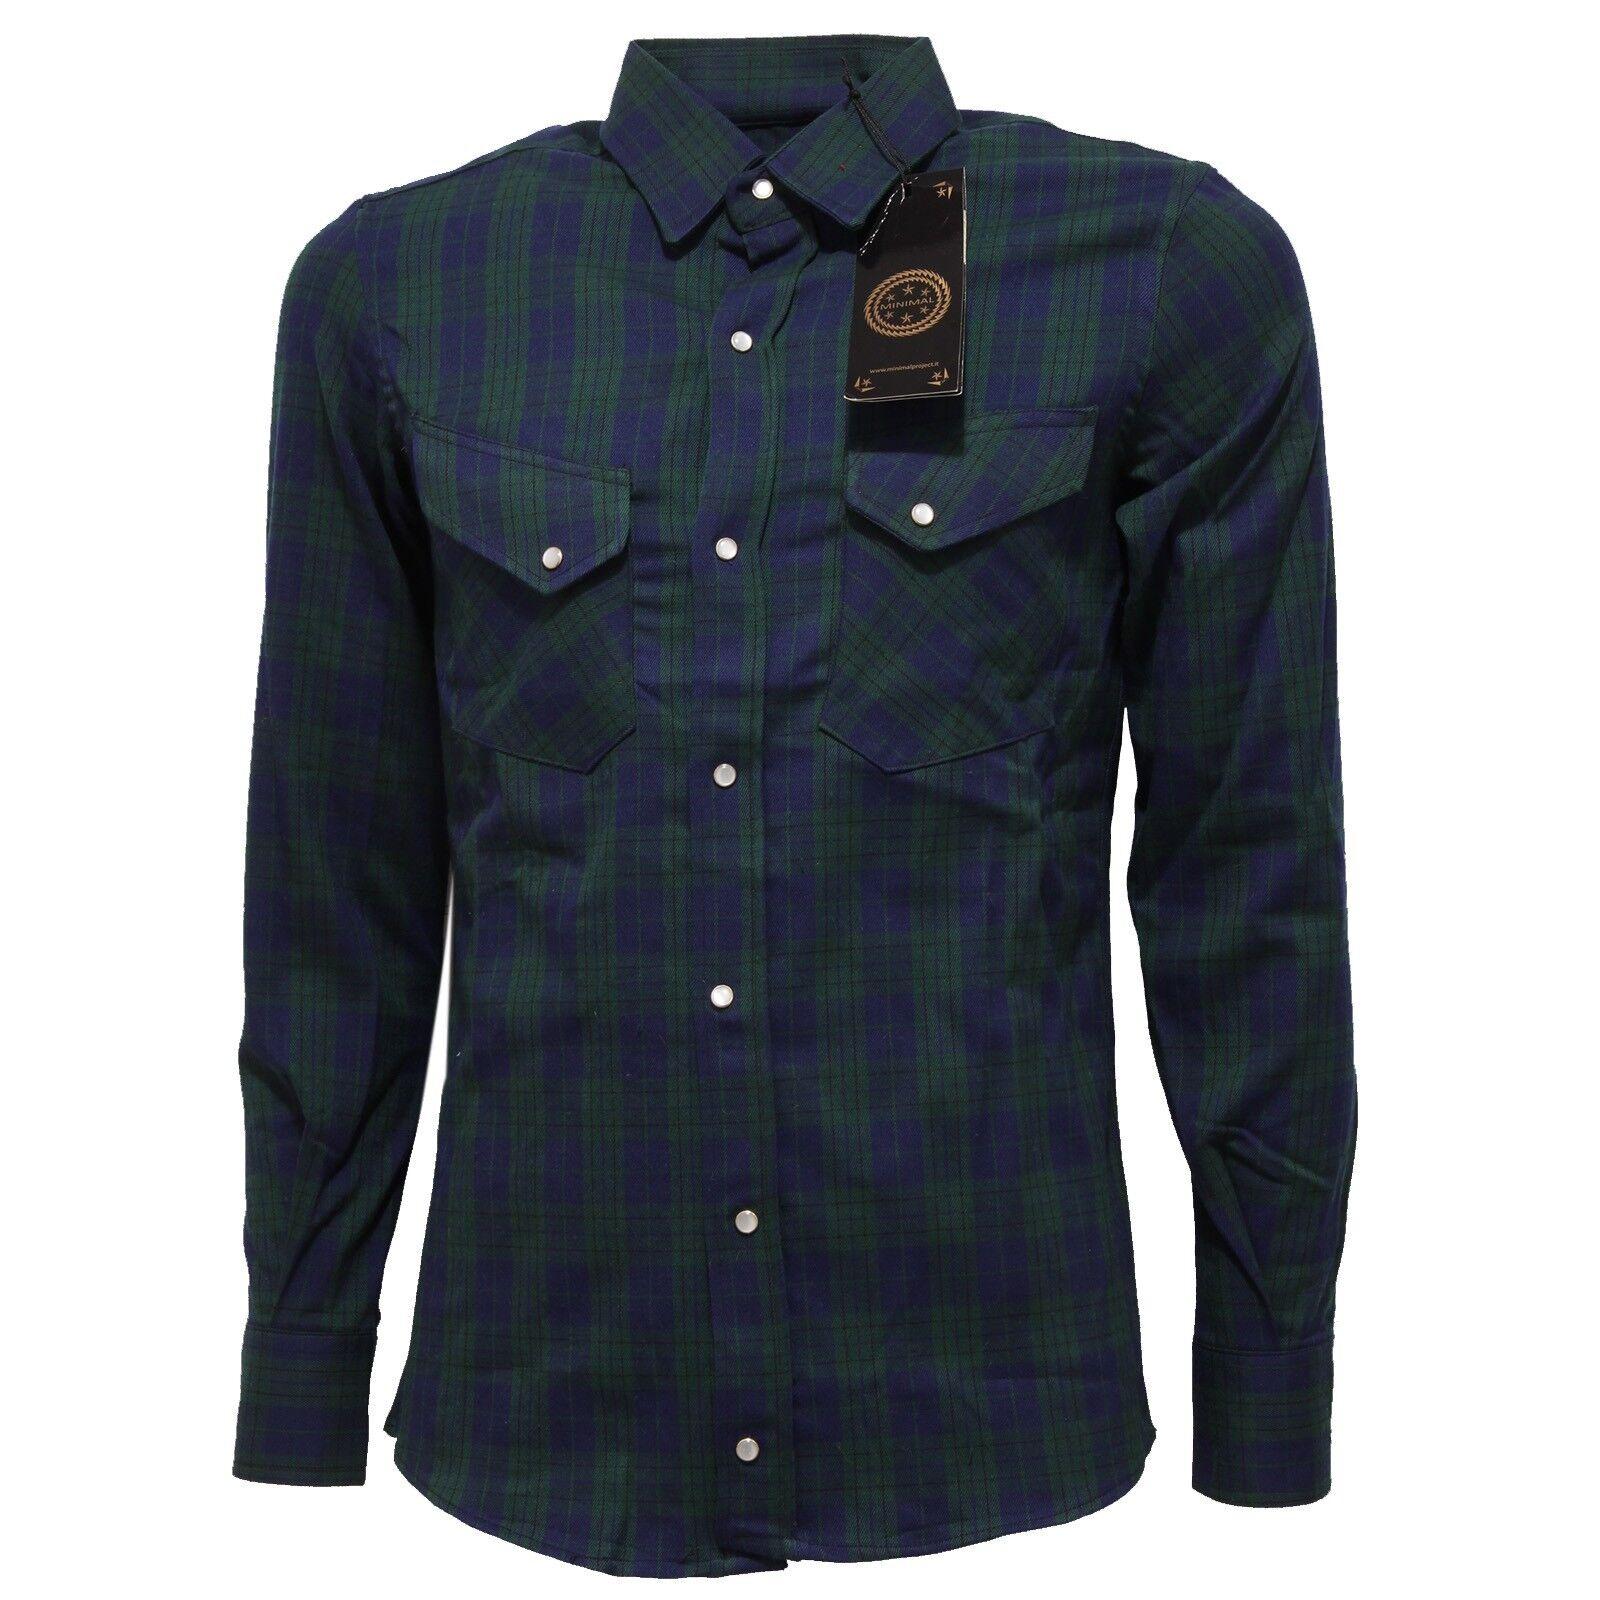 4927Q camicia uomo MINIMAL cotone verde blu shirt long sleeve men